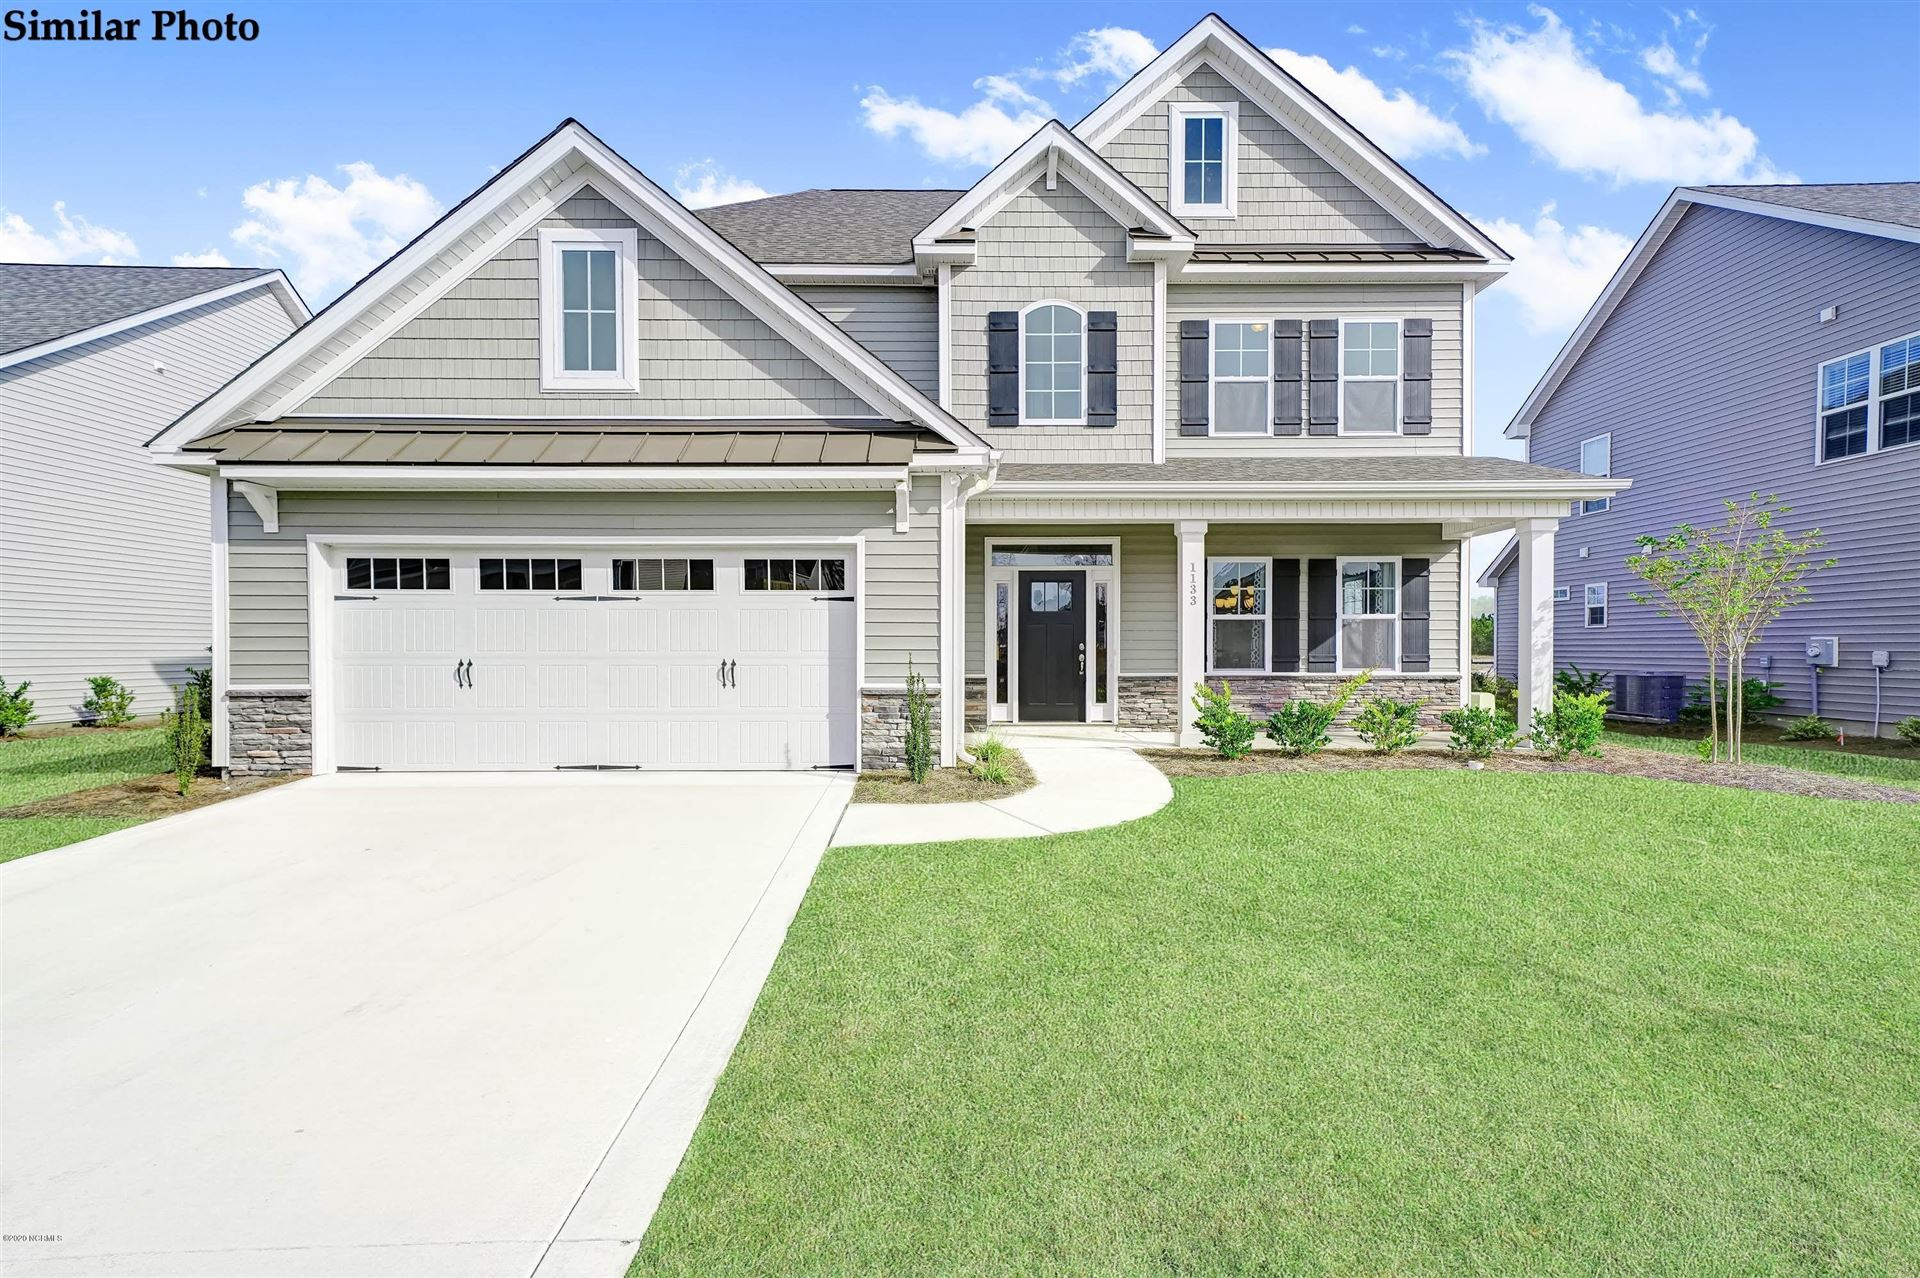 101 East Yellow Lois Drive, Hampstead, NC 28443 - MLS#: 100250066